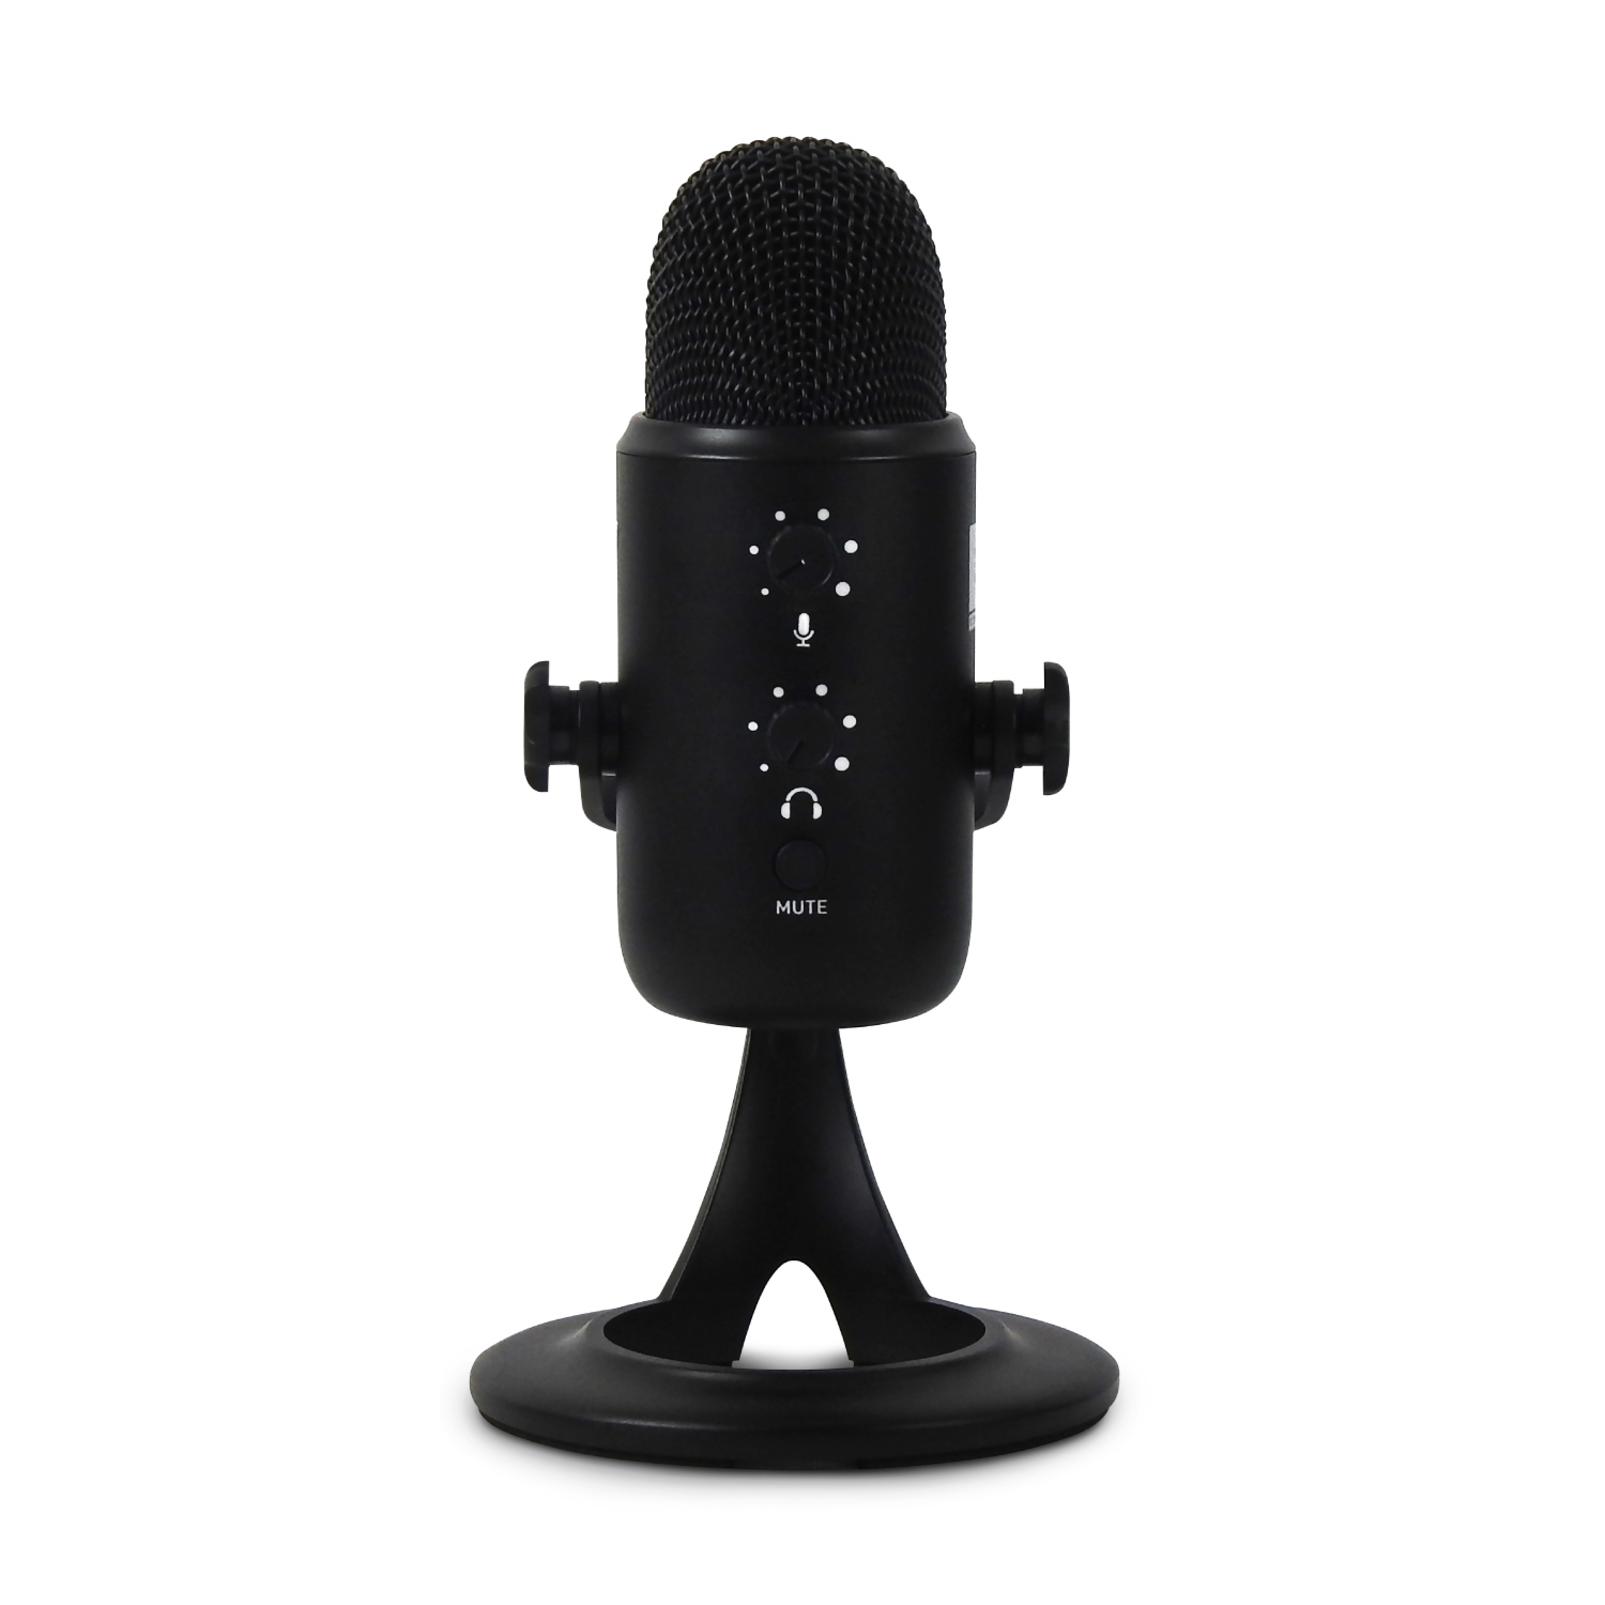 JBLCSUM10 - Black - Compact USB Microphone - Hero